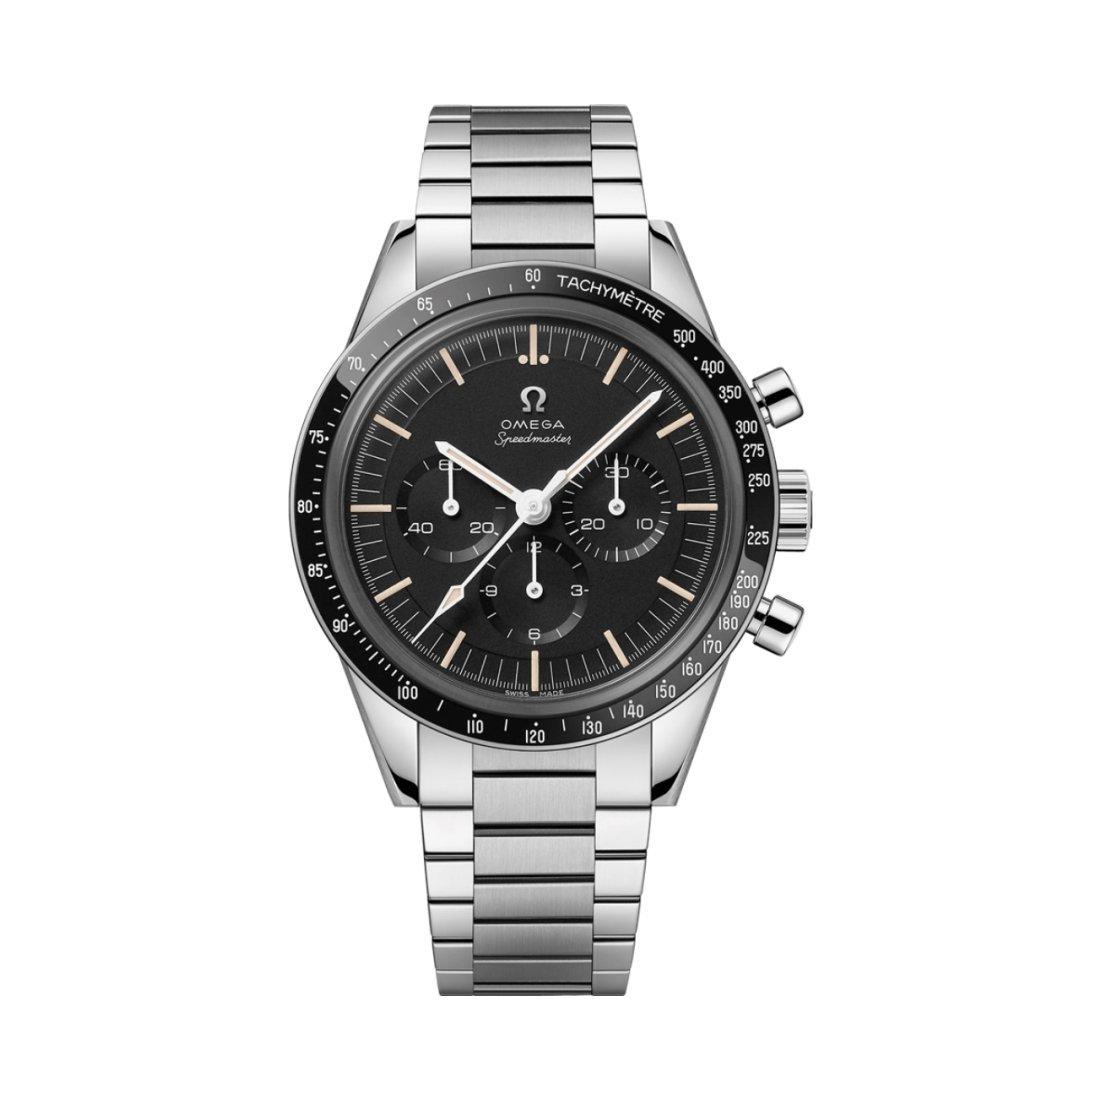 Montre Omega Speedmaster Moonwatch Chronographe Calibre 321 39.7mm vue 1